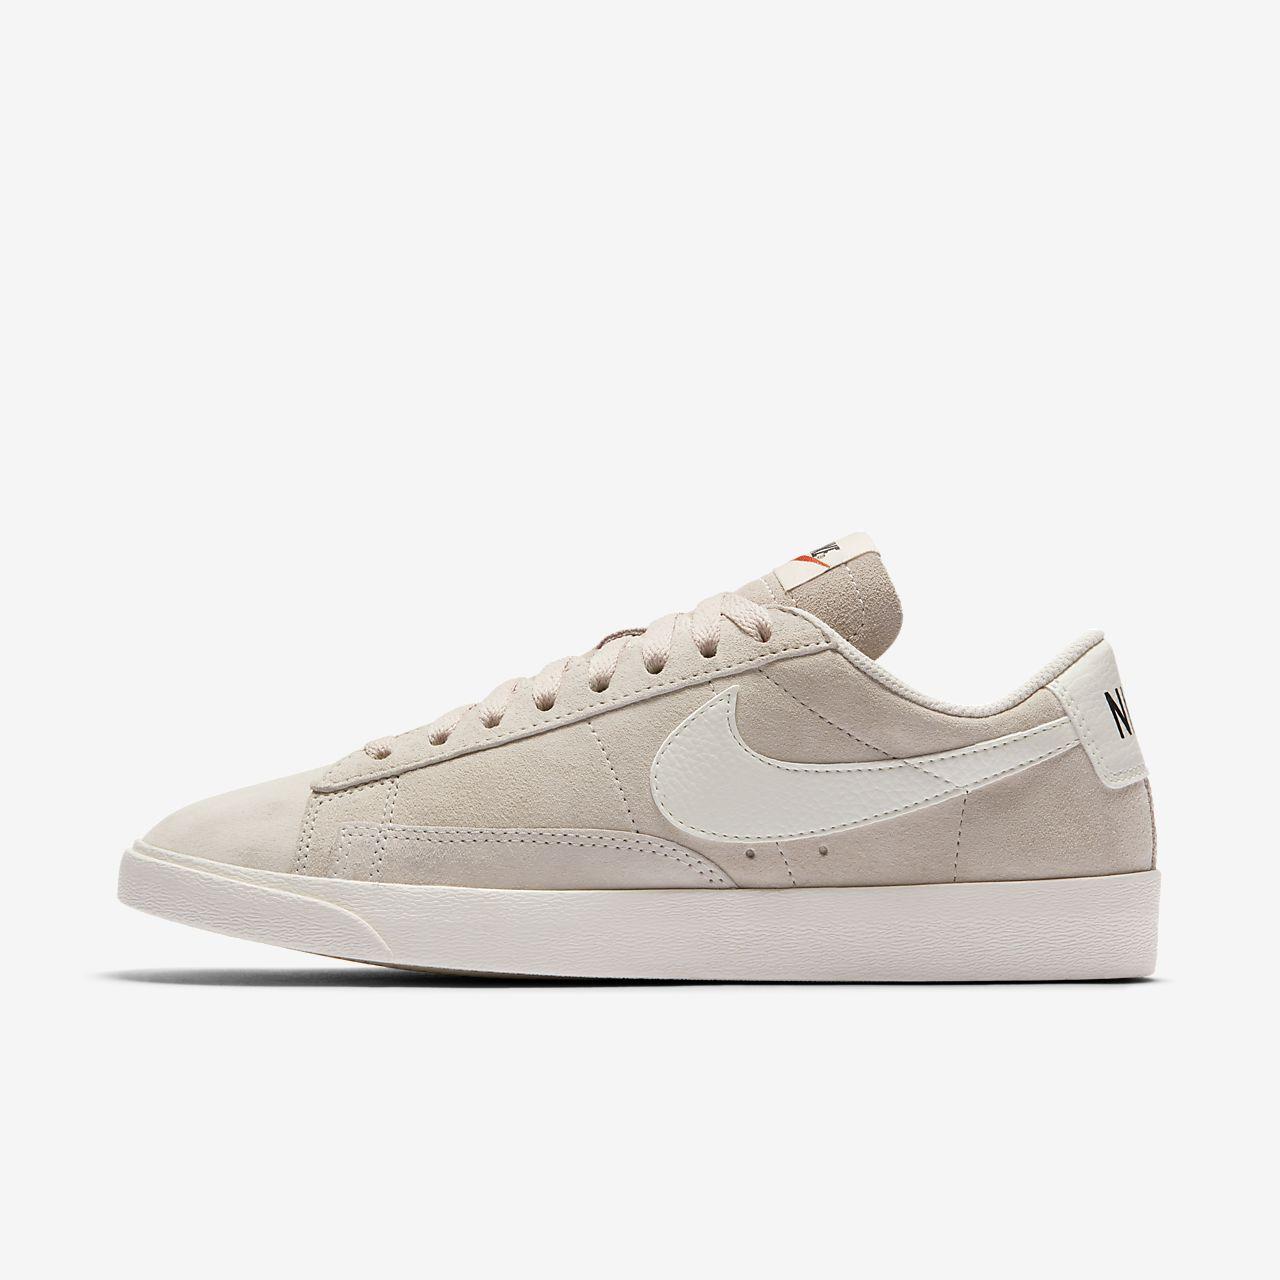 ... Chaussure Nike Blazer Low pour Femme